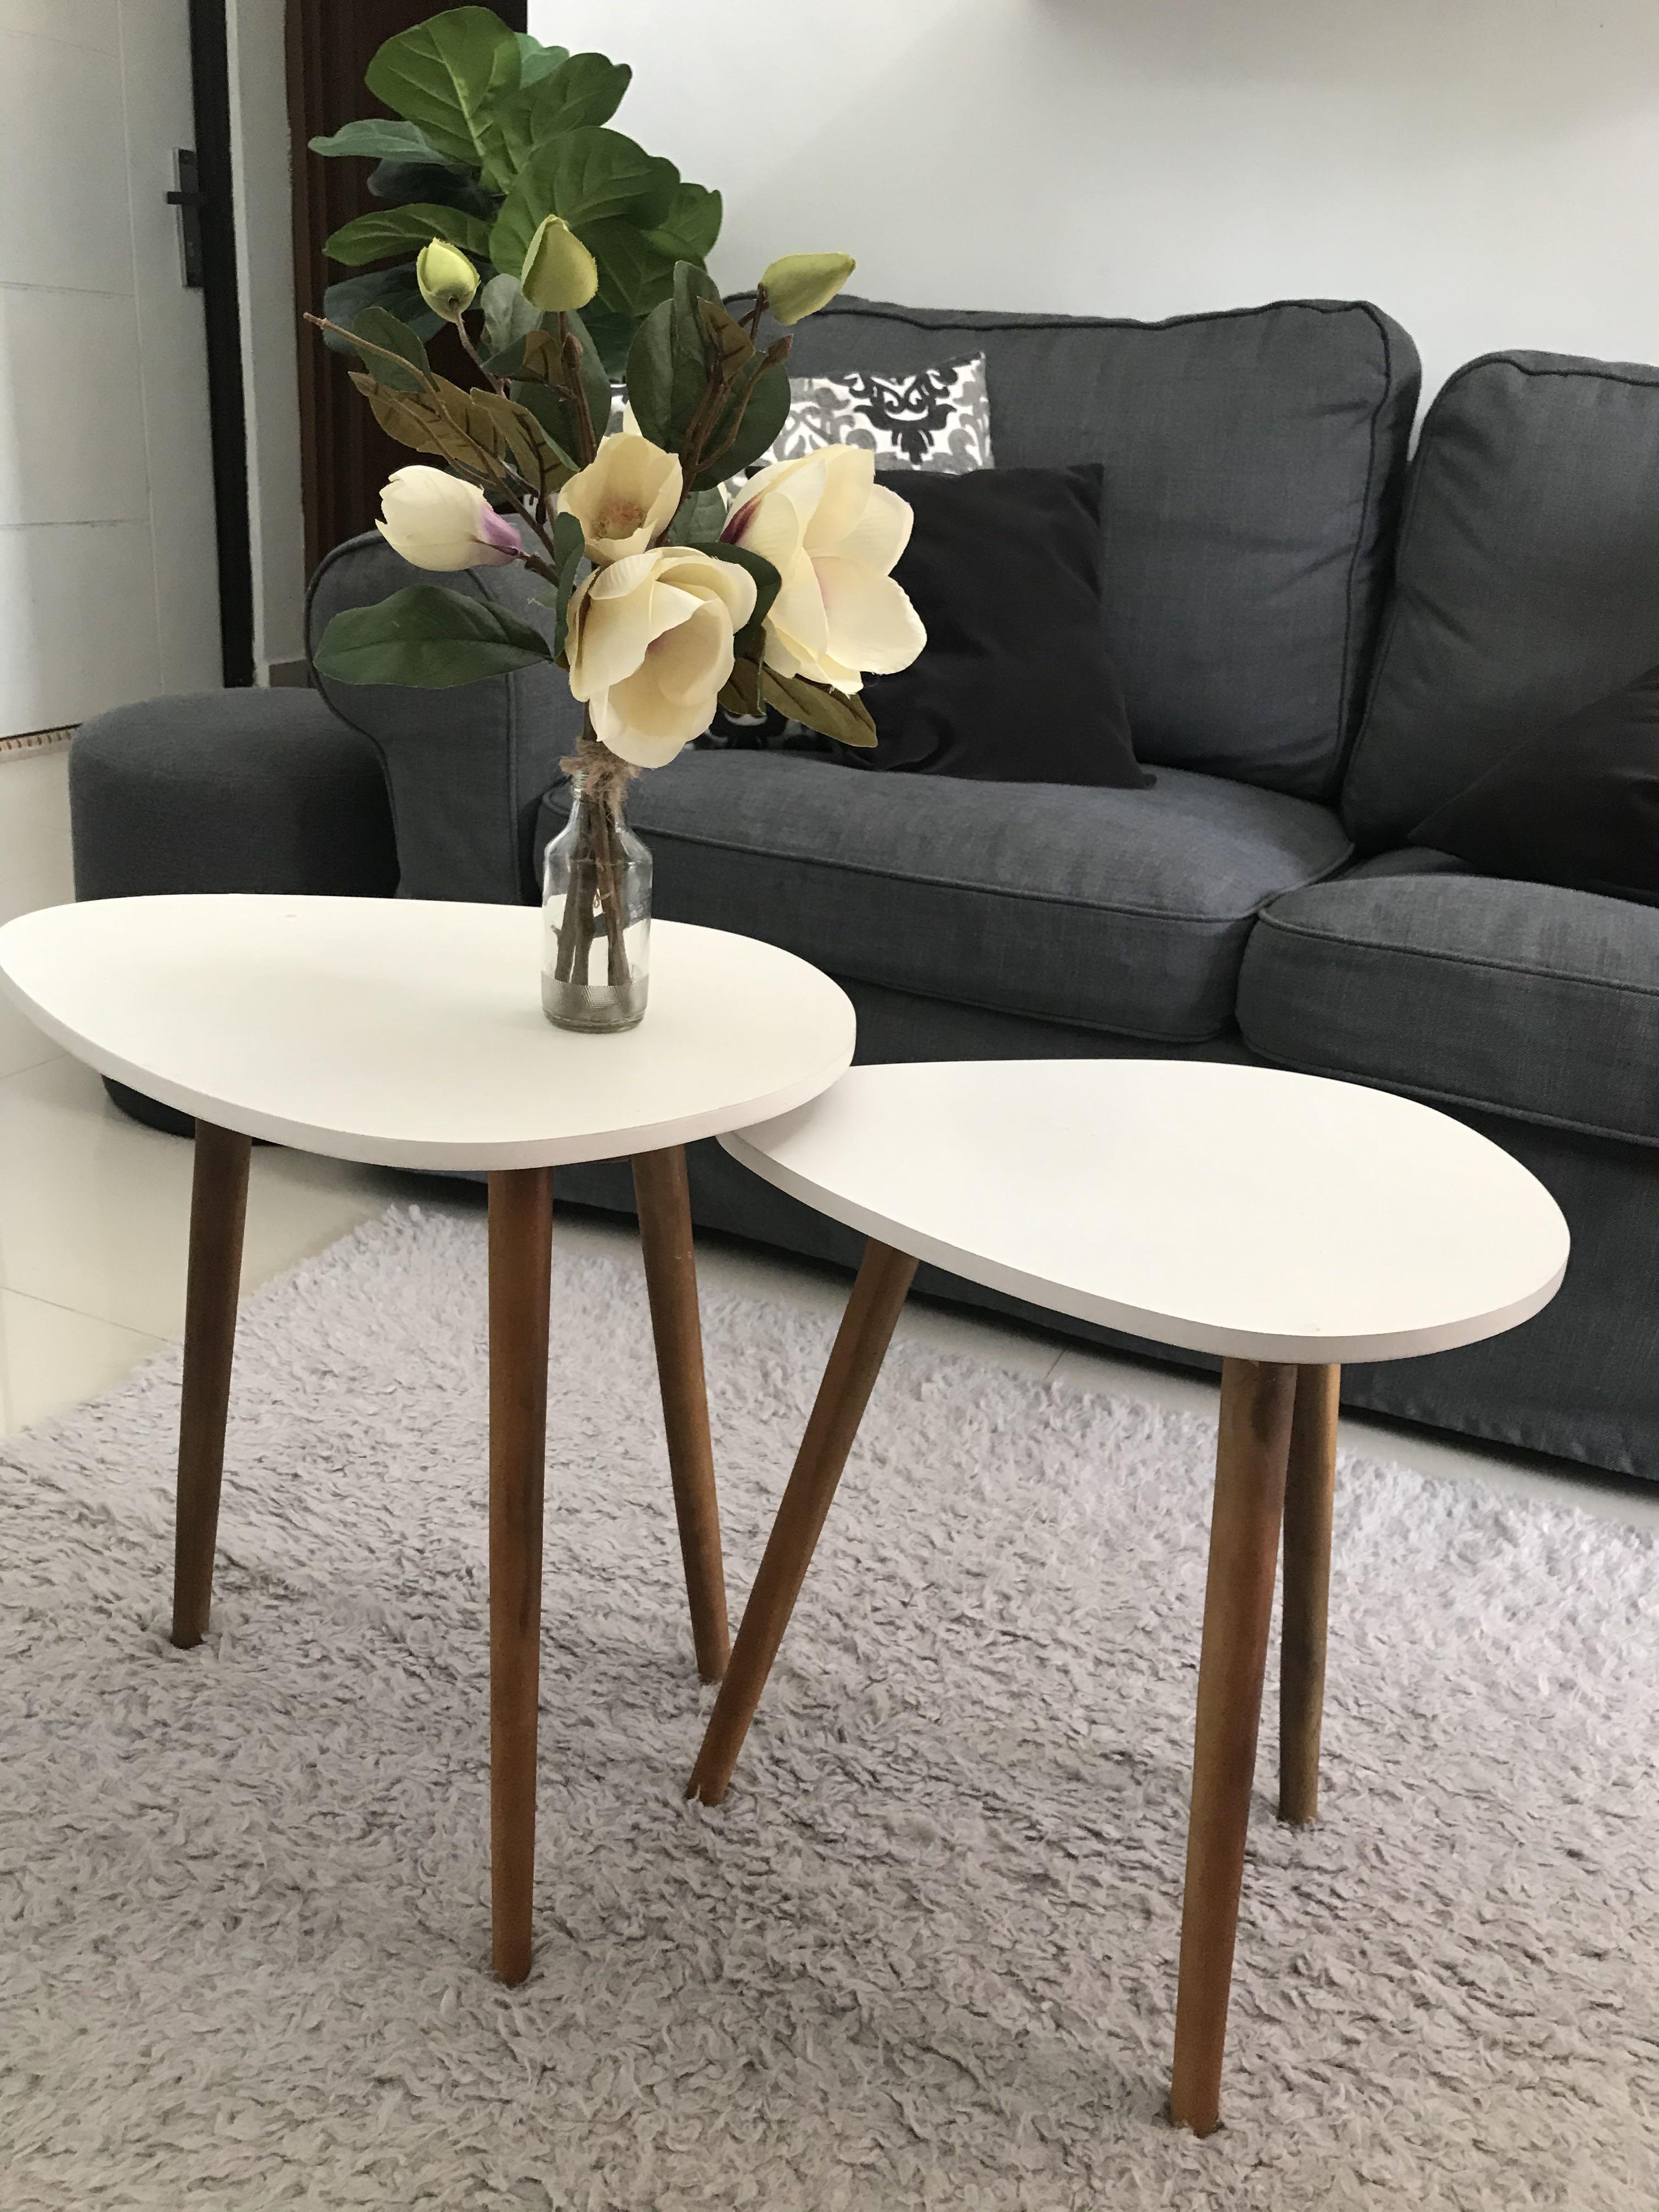 Meja Bukan Ikea Table Ruang Tamu Samping Perabotan Rumah Di Carousell